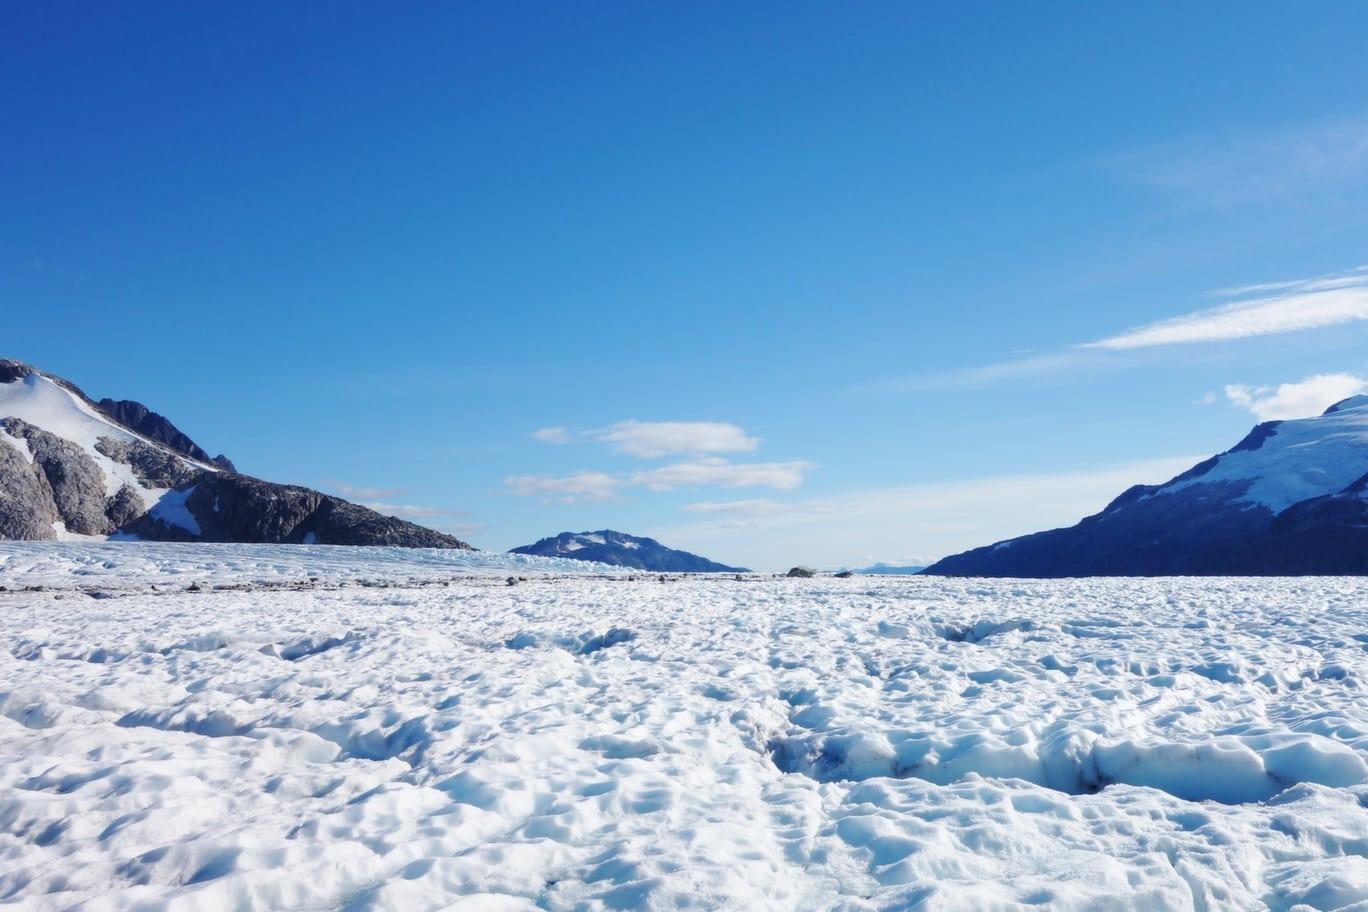 Celebrity Solstice, Alaska, Cruise, Juneau, Cruising, Shore Excursion, Port of Call, Mendenhall Glacier